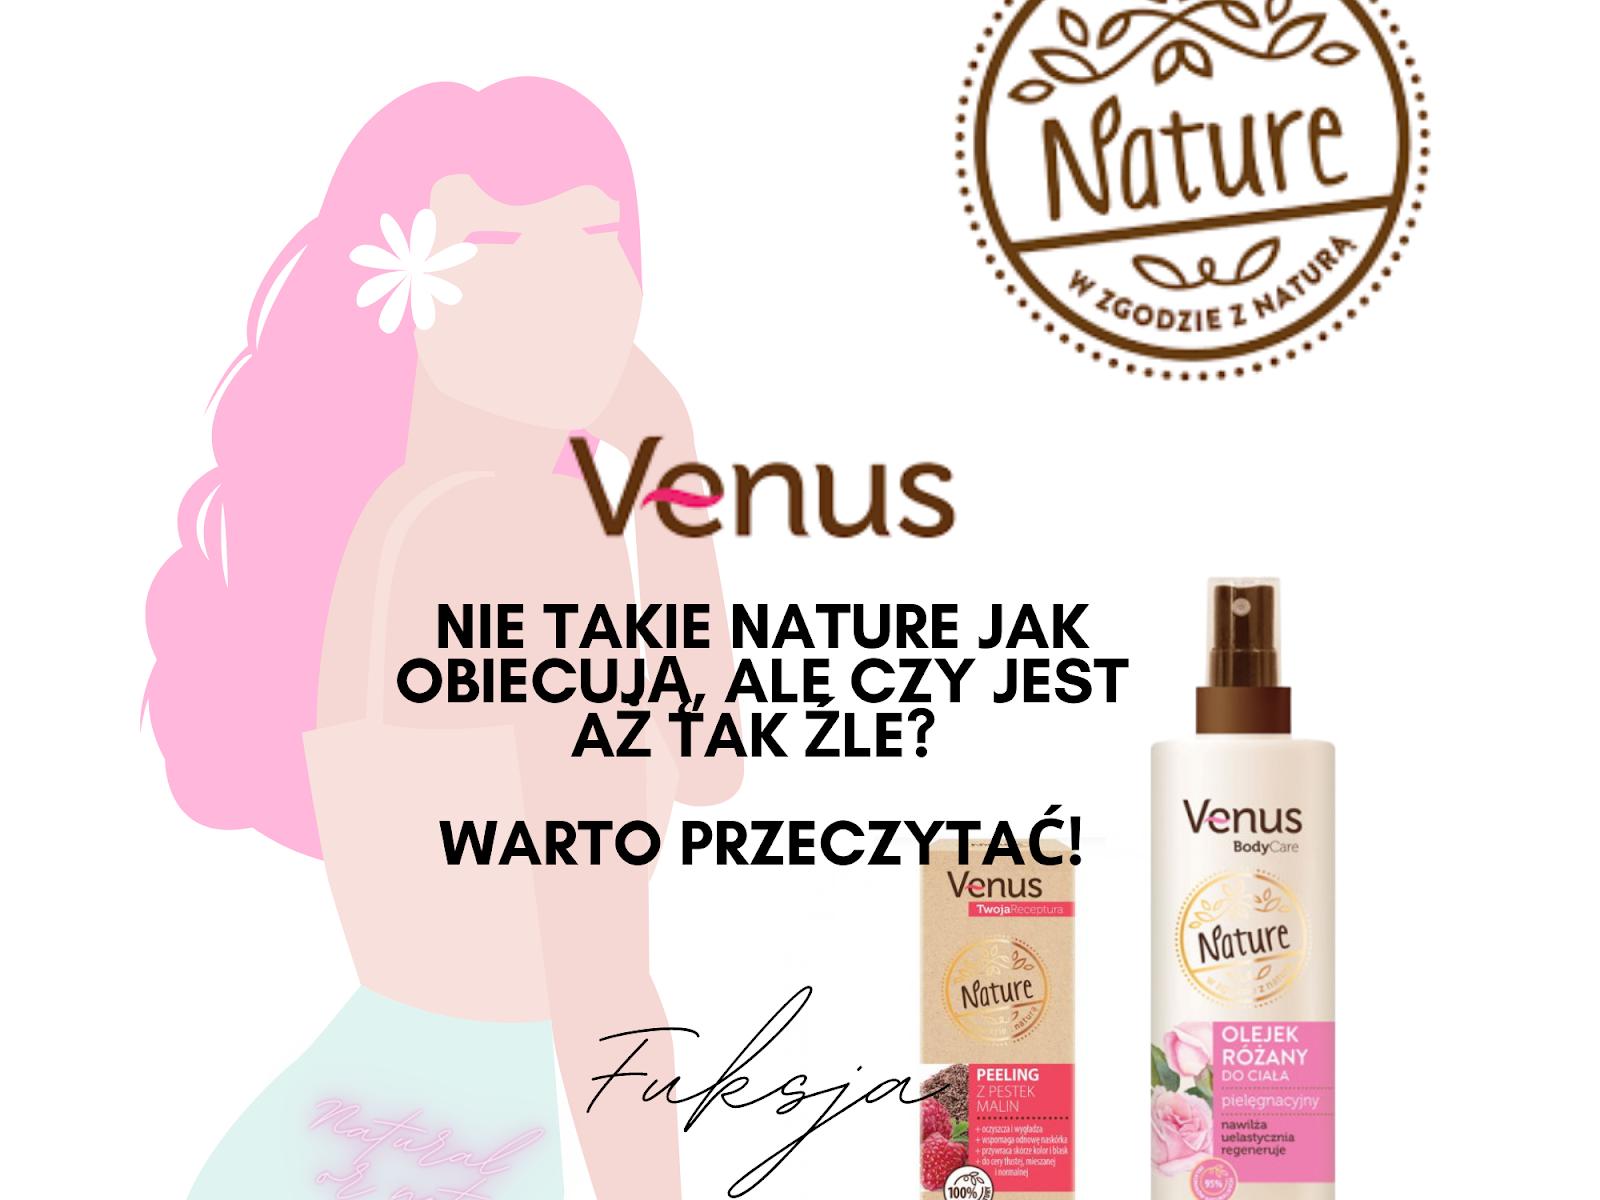 Venus Nature i drama, bo nie nature..